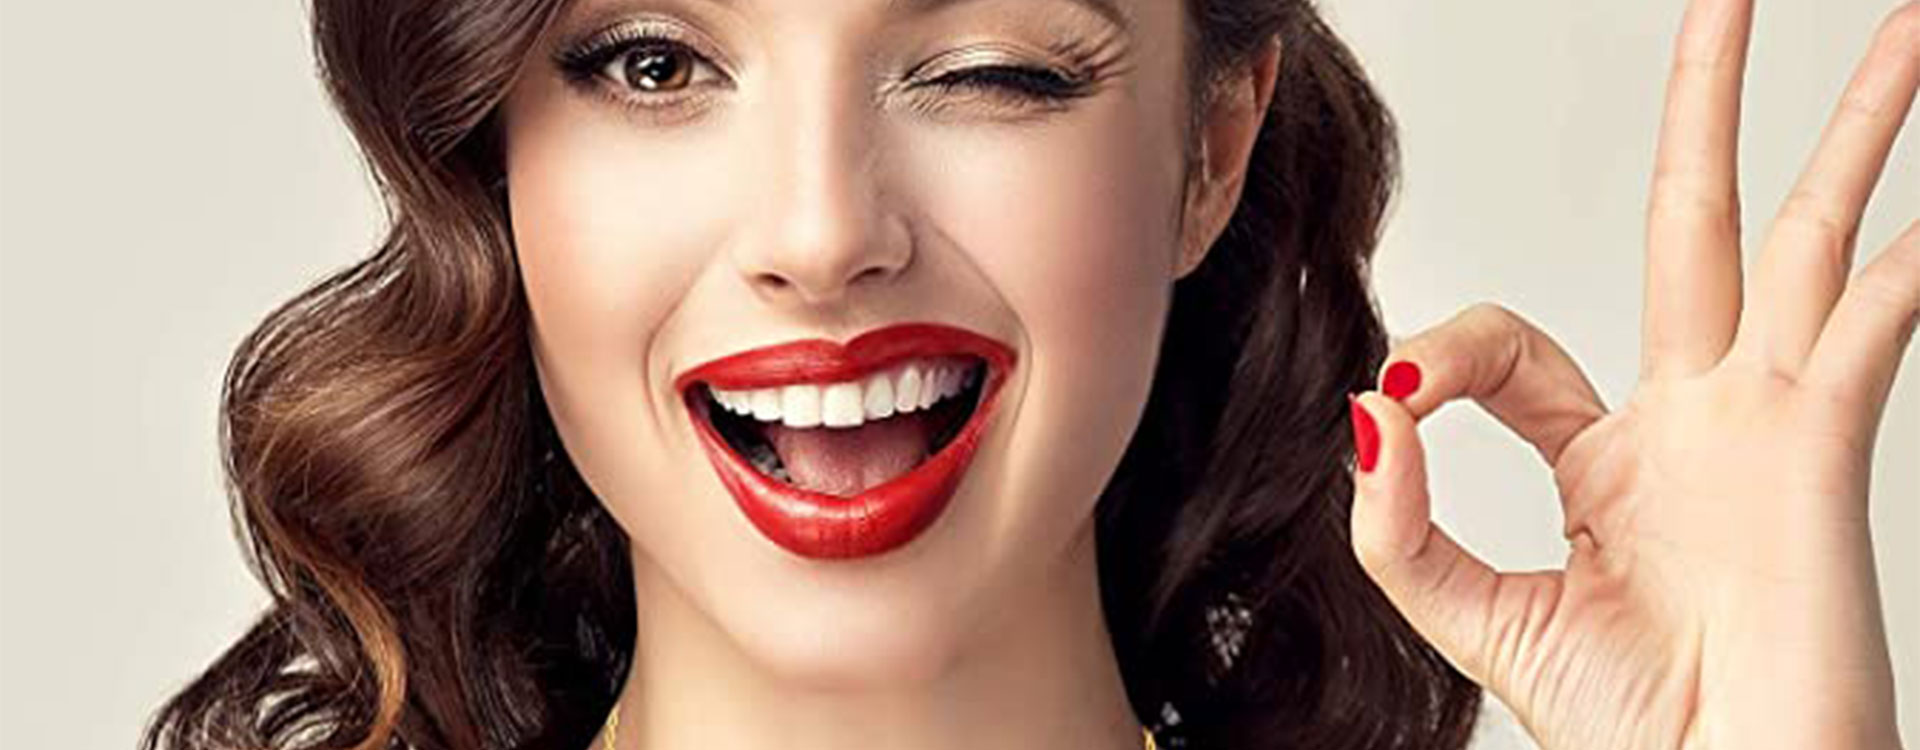 maquillaje de moretones